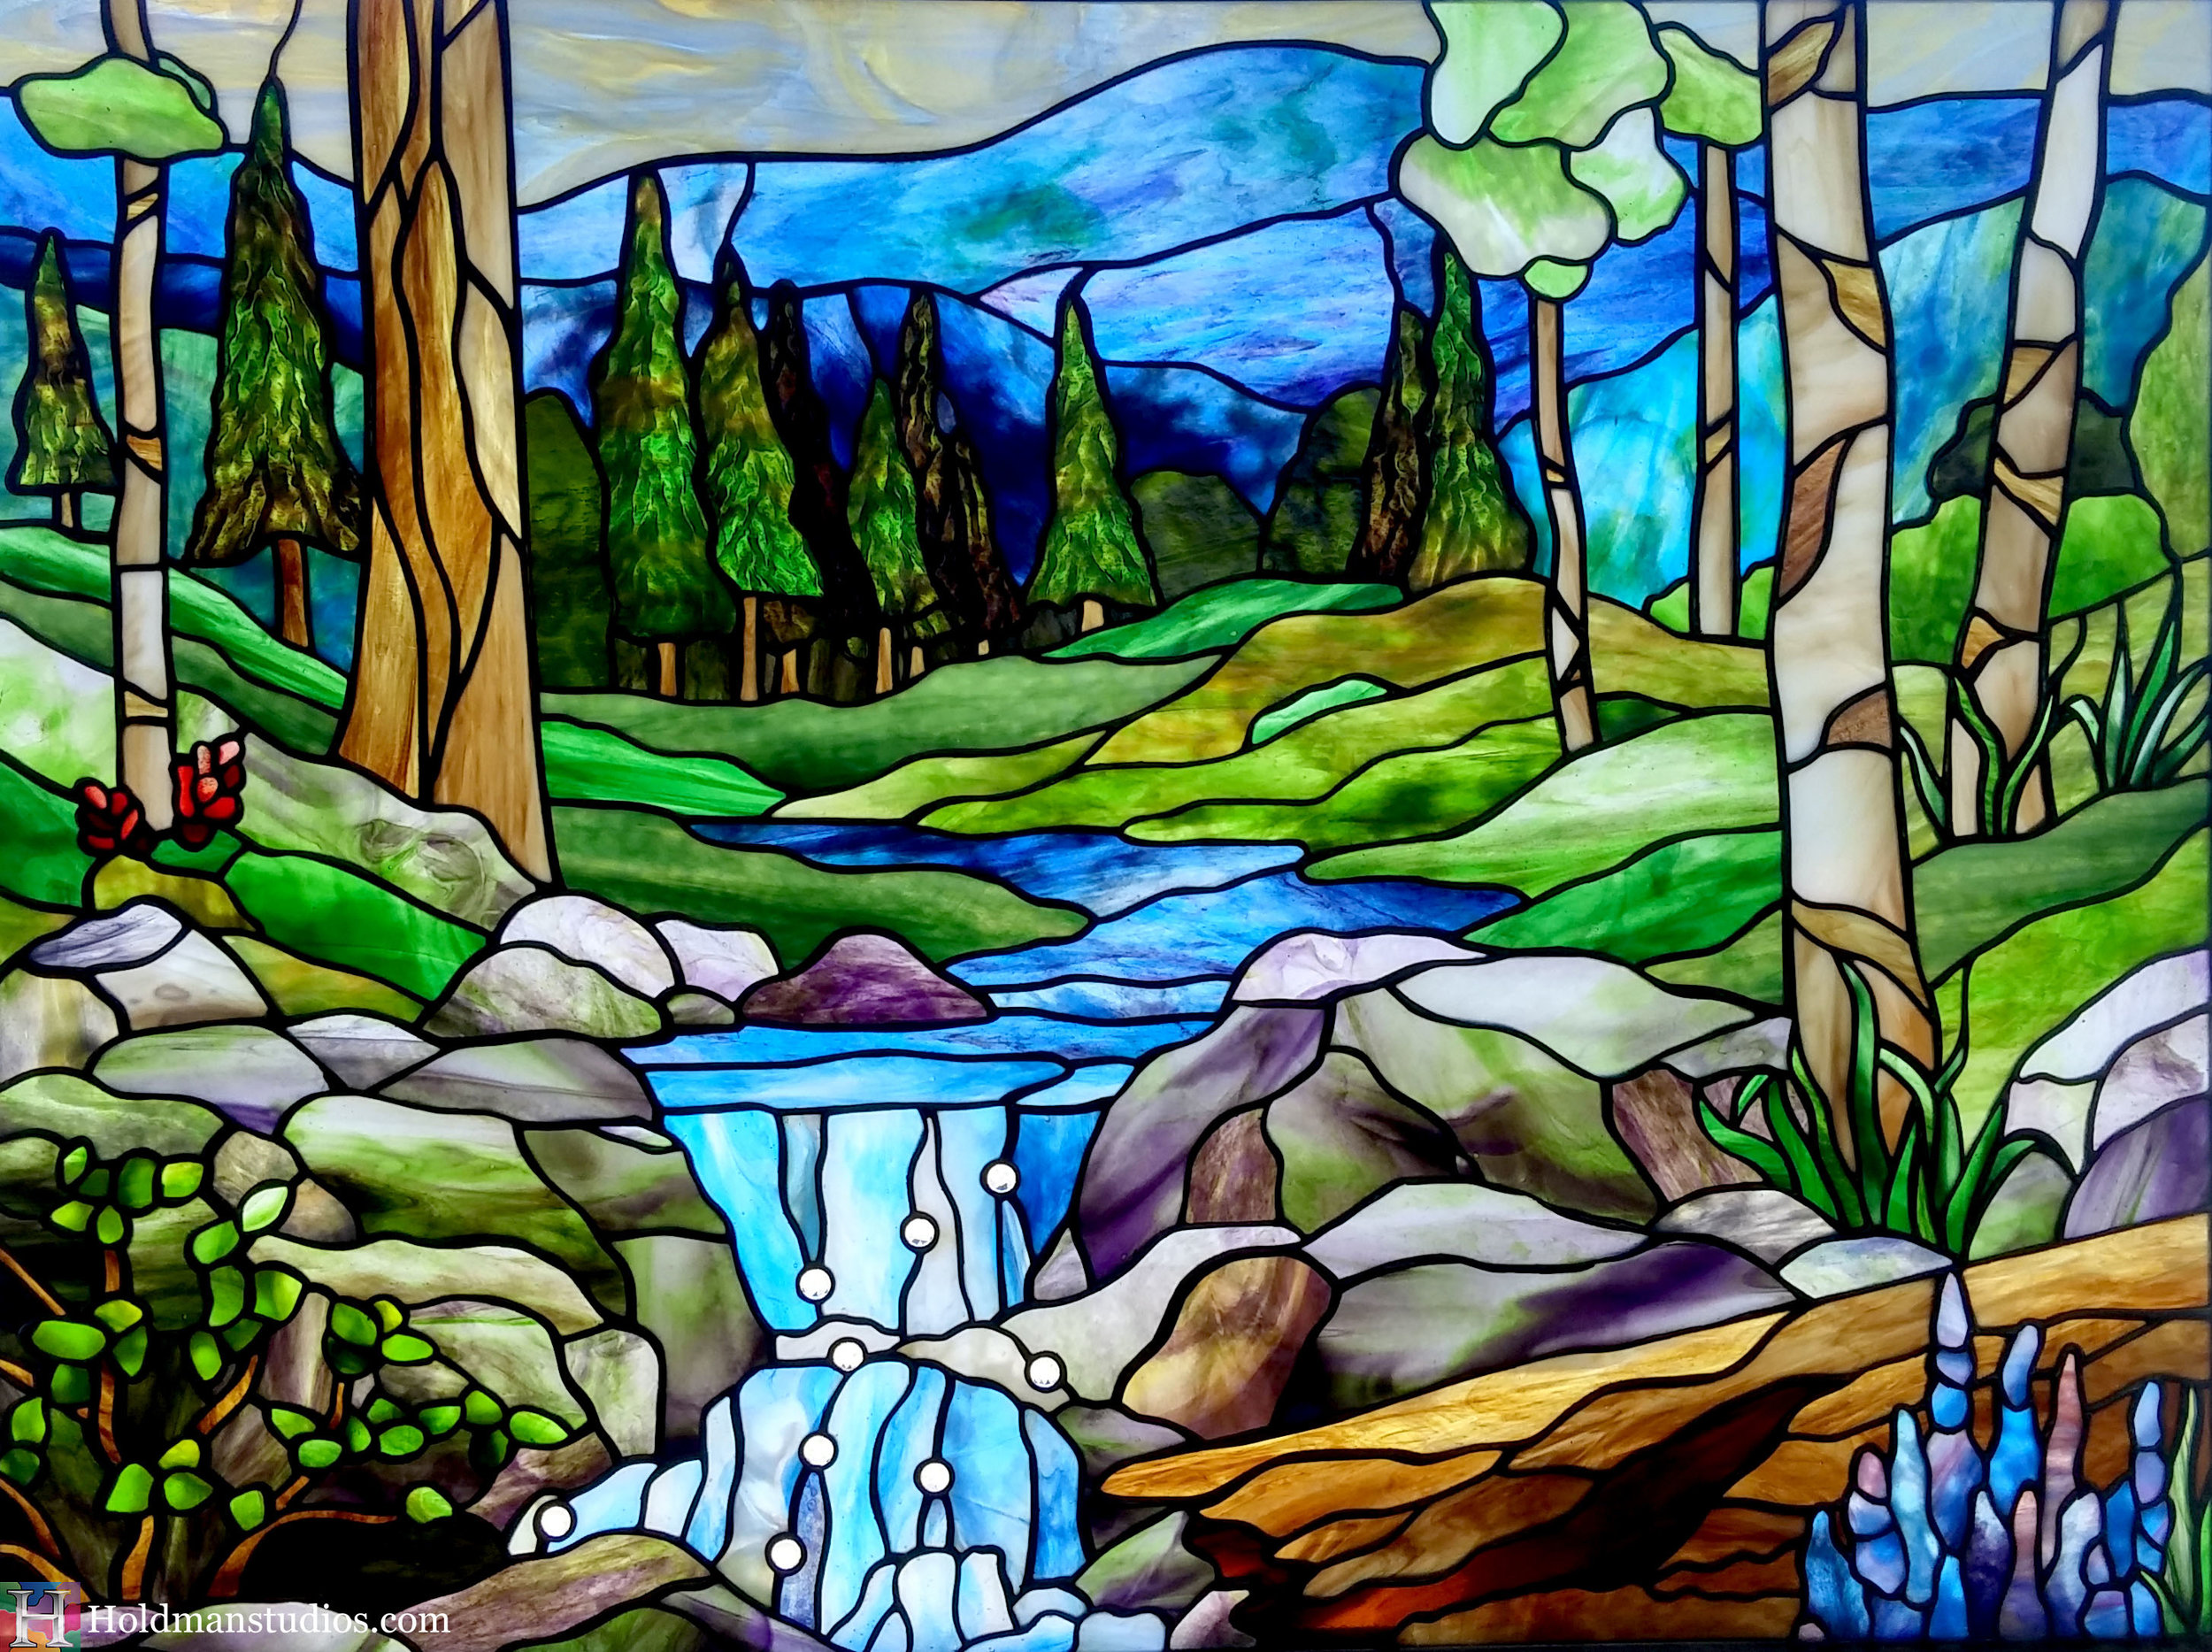 Holdman-Studios-Stained-Glass-Sky-Clouds-Aspen-Pine-Trees-Log-Flowers-Leaves-Plants-River-Mountains-Rocks.jpg